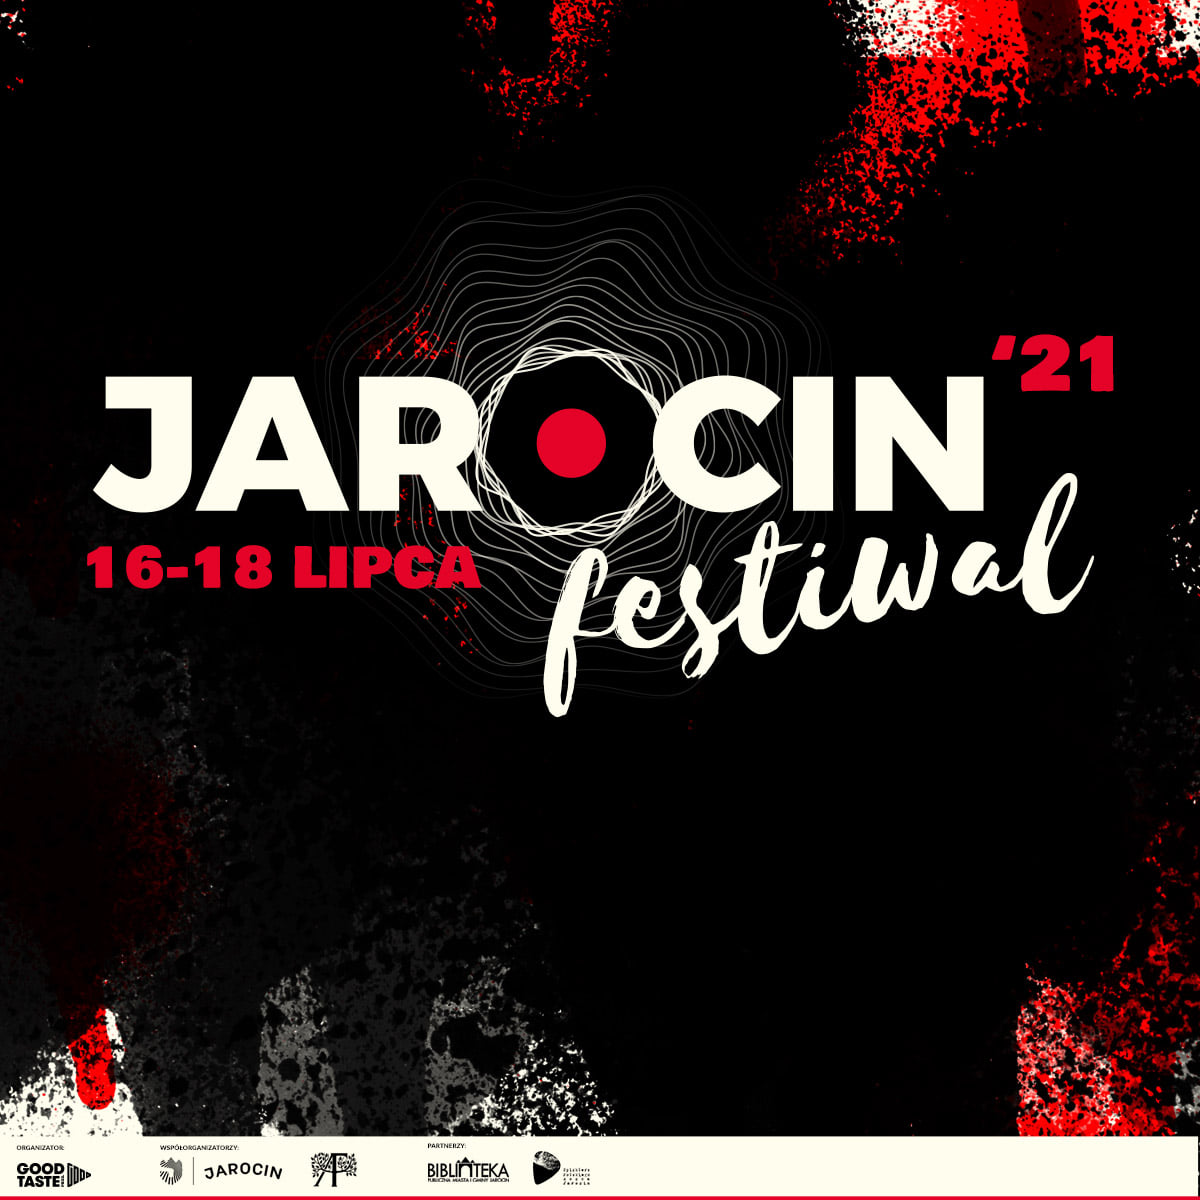 Jarocin Festiwal 2021 startuje za 3 miesiące :D